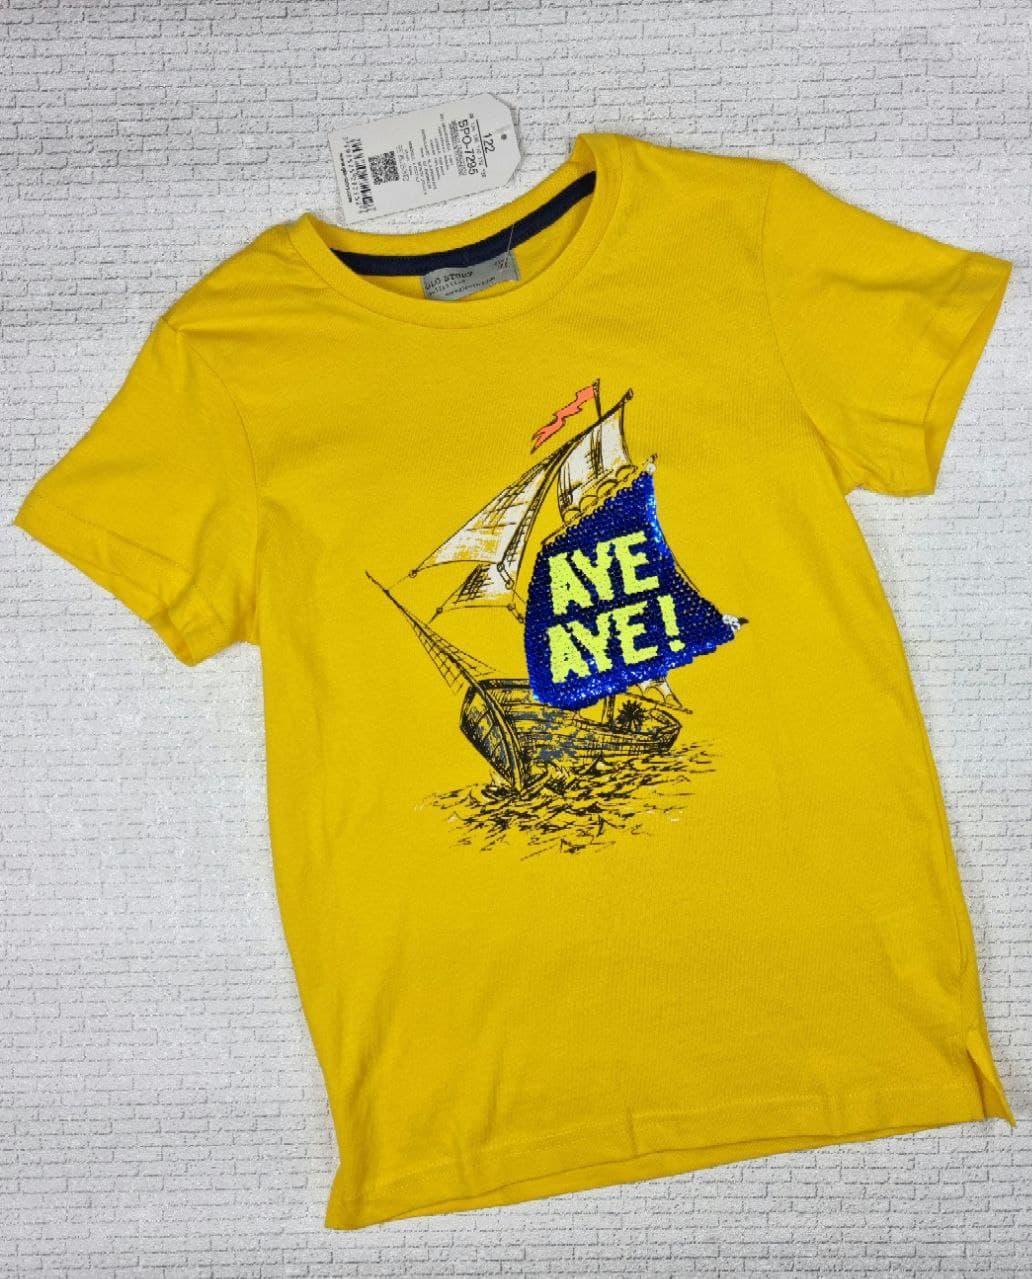 Футболка GLO-STORY на мальчика  122, 128 см, жёлтый